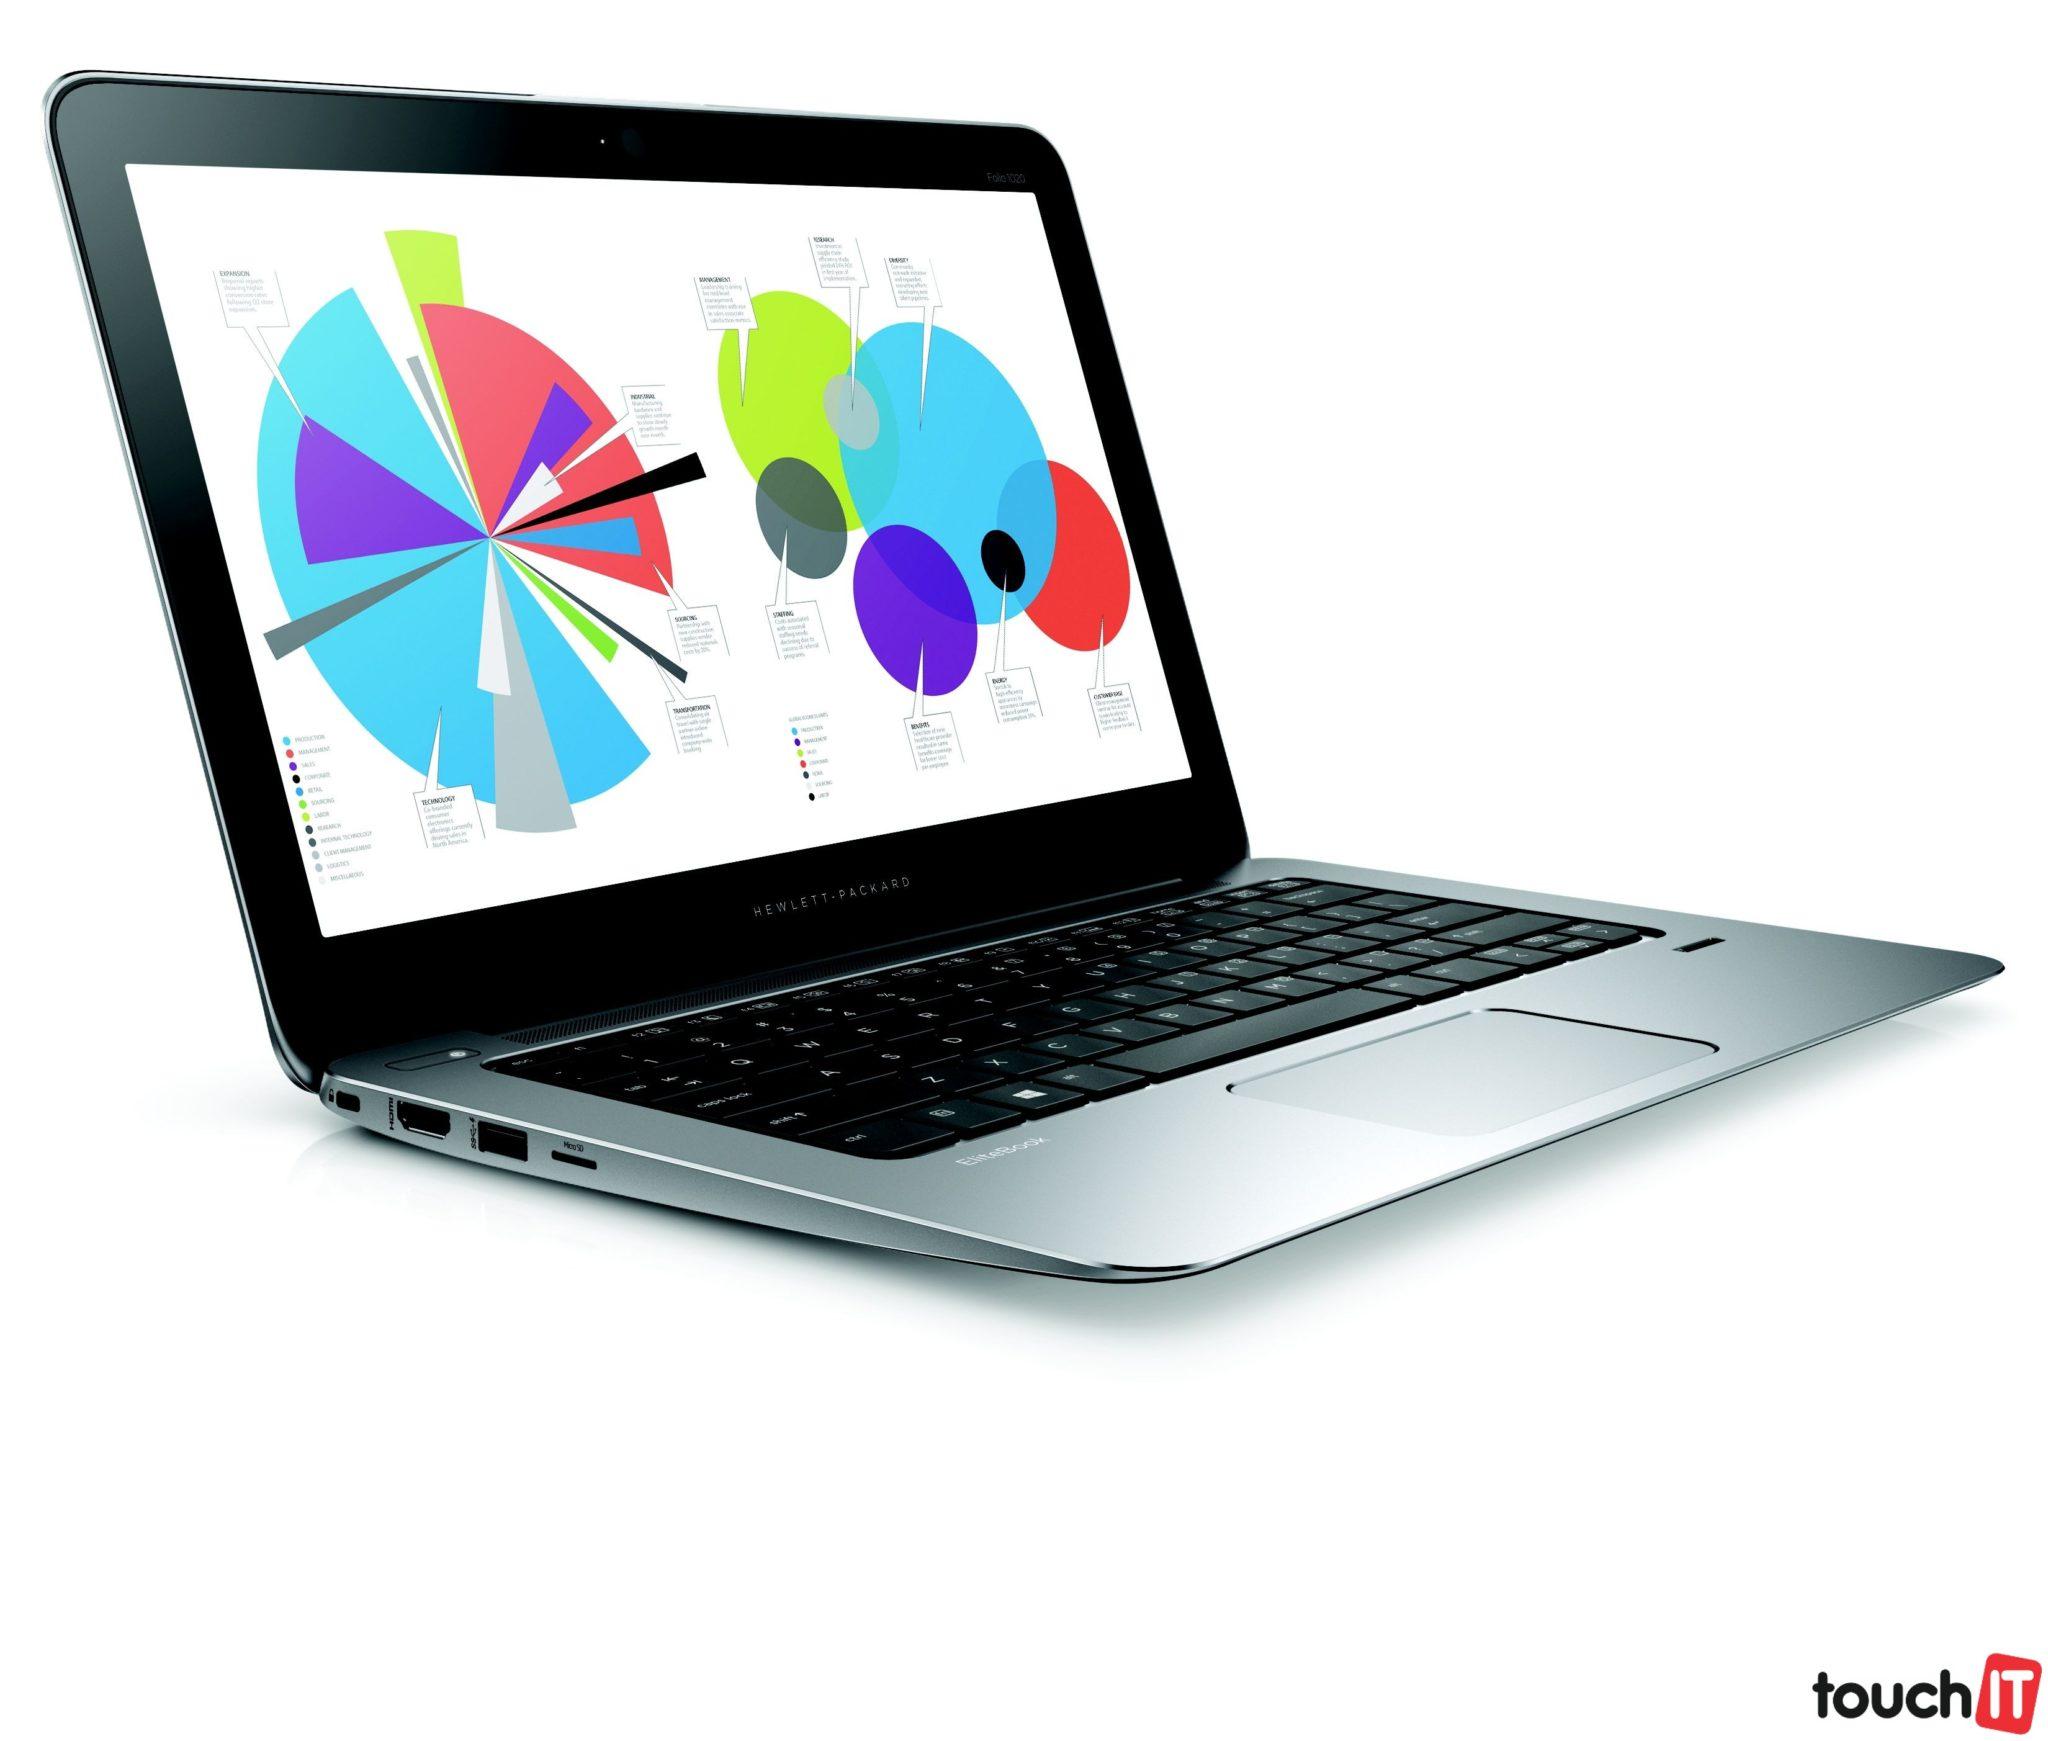 HP_EliteBook_1020_G2_non-touch___Catalog__Right_facing.0 (1)